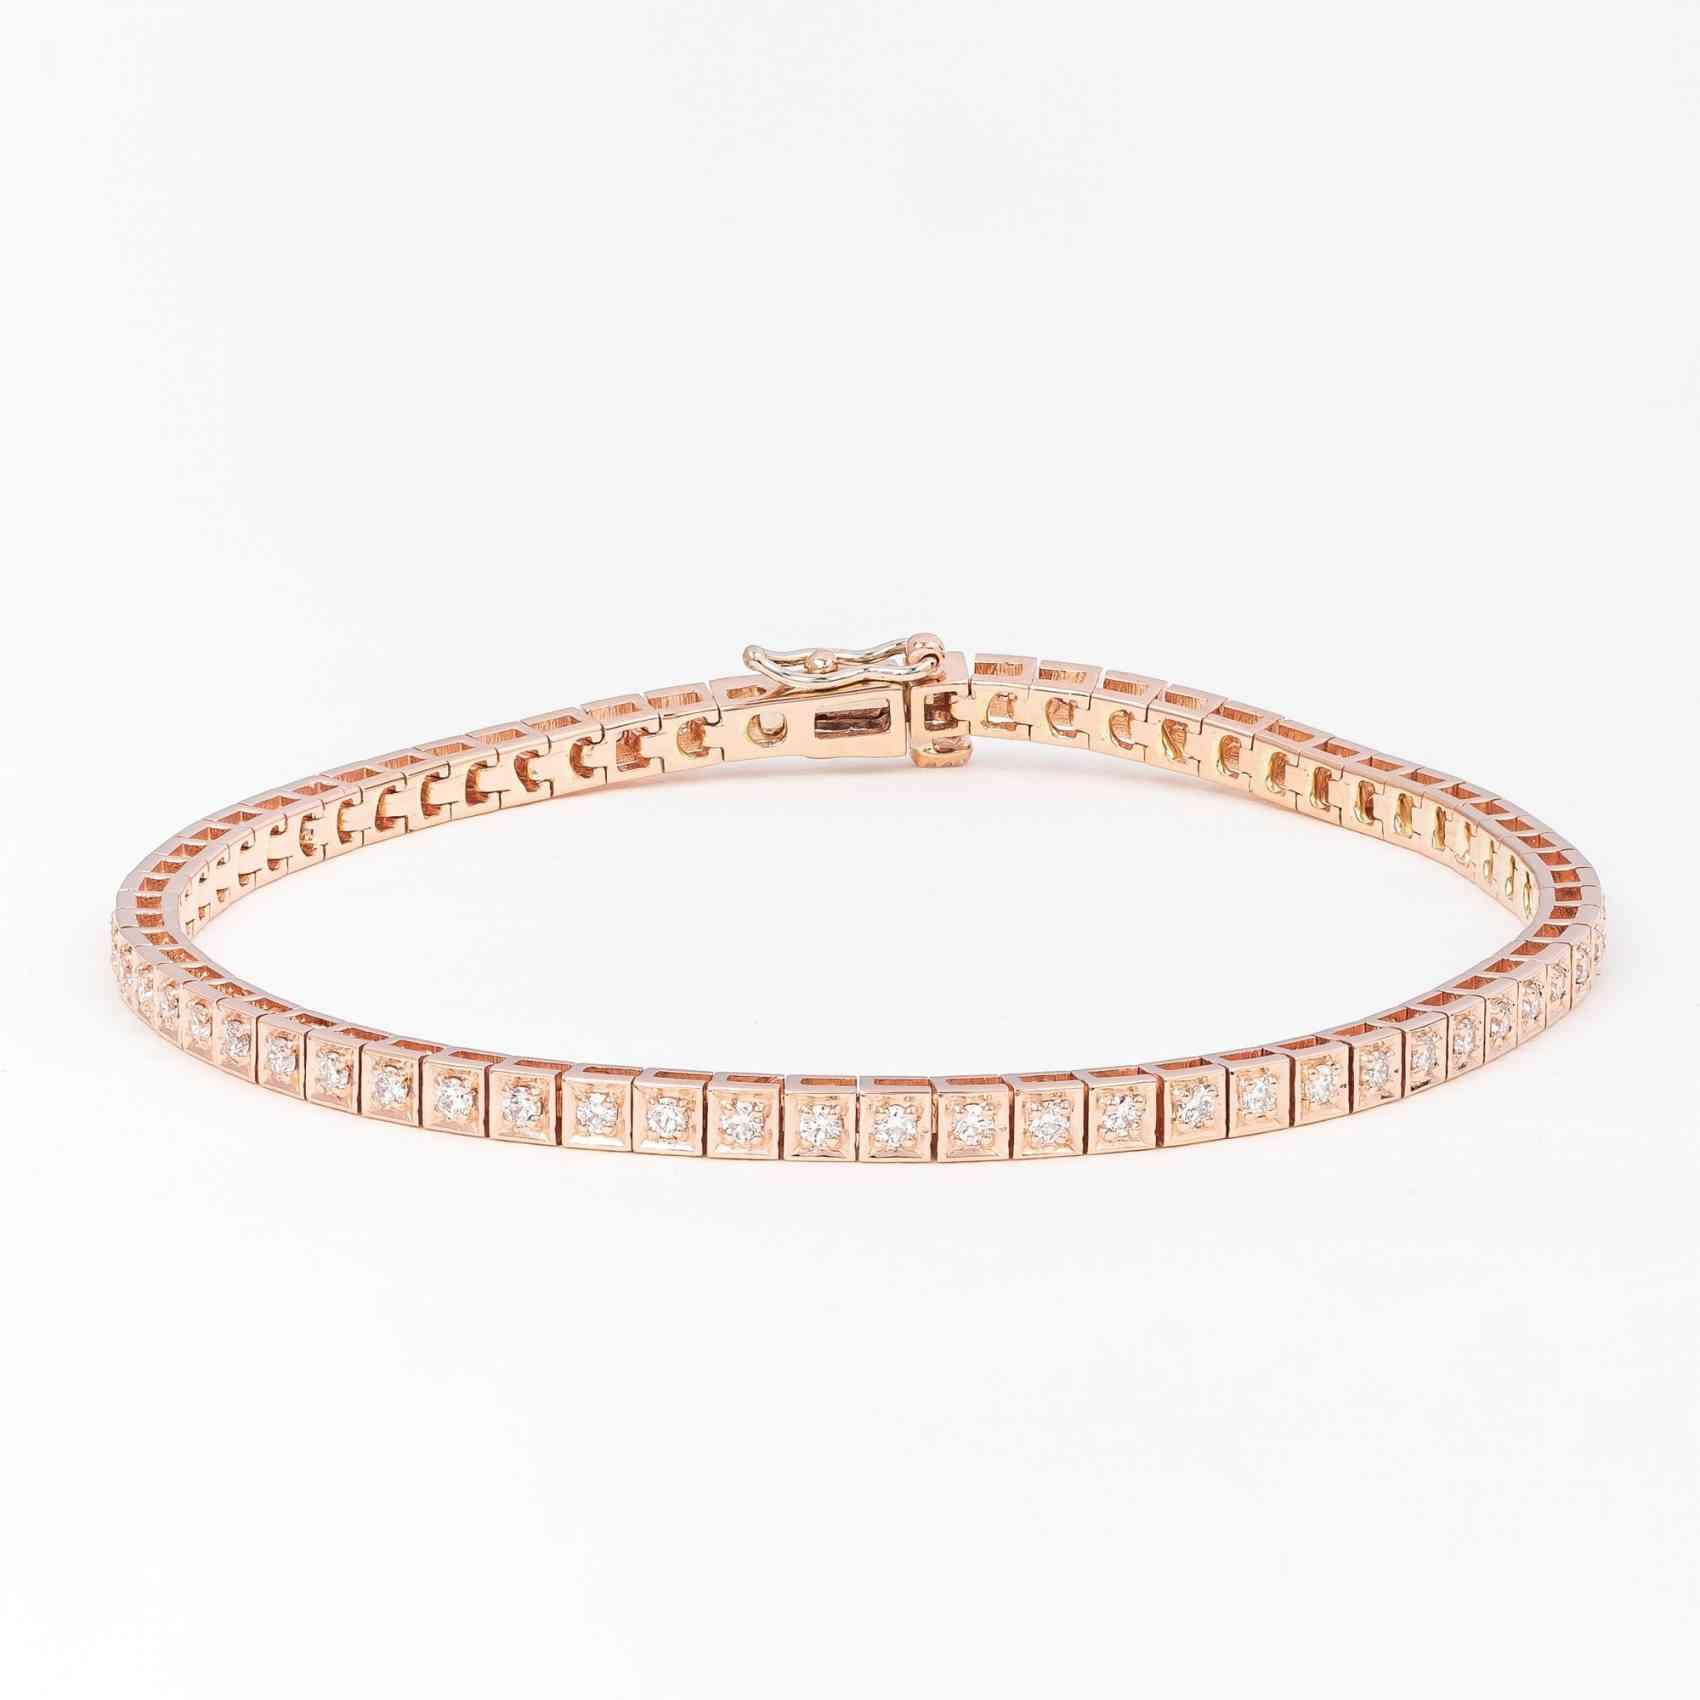 Bratara din Aur Roz de 14K cu Diamante